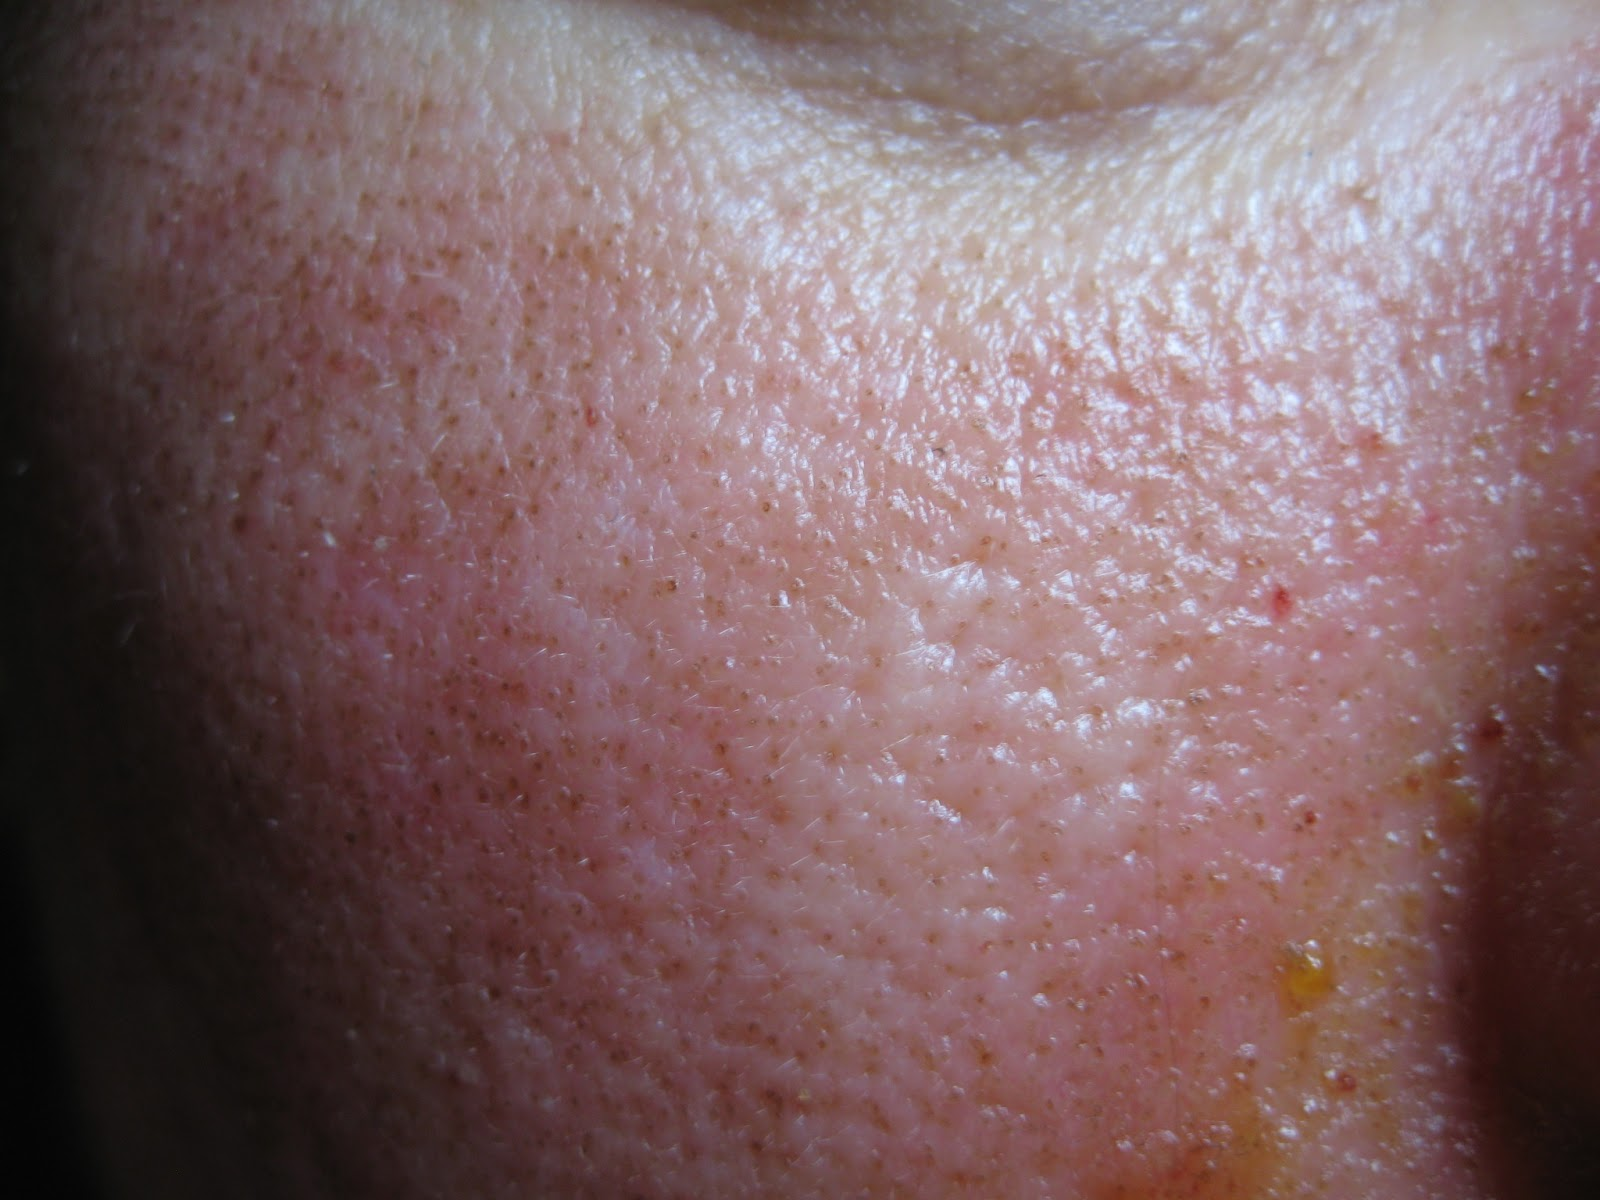 A humán papilloma vírus